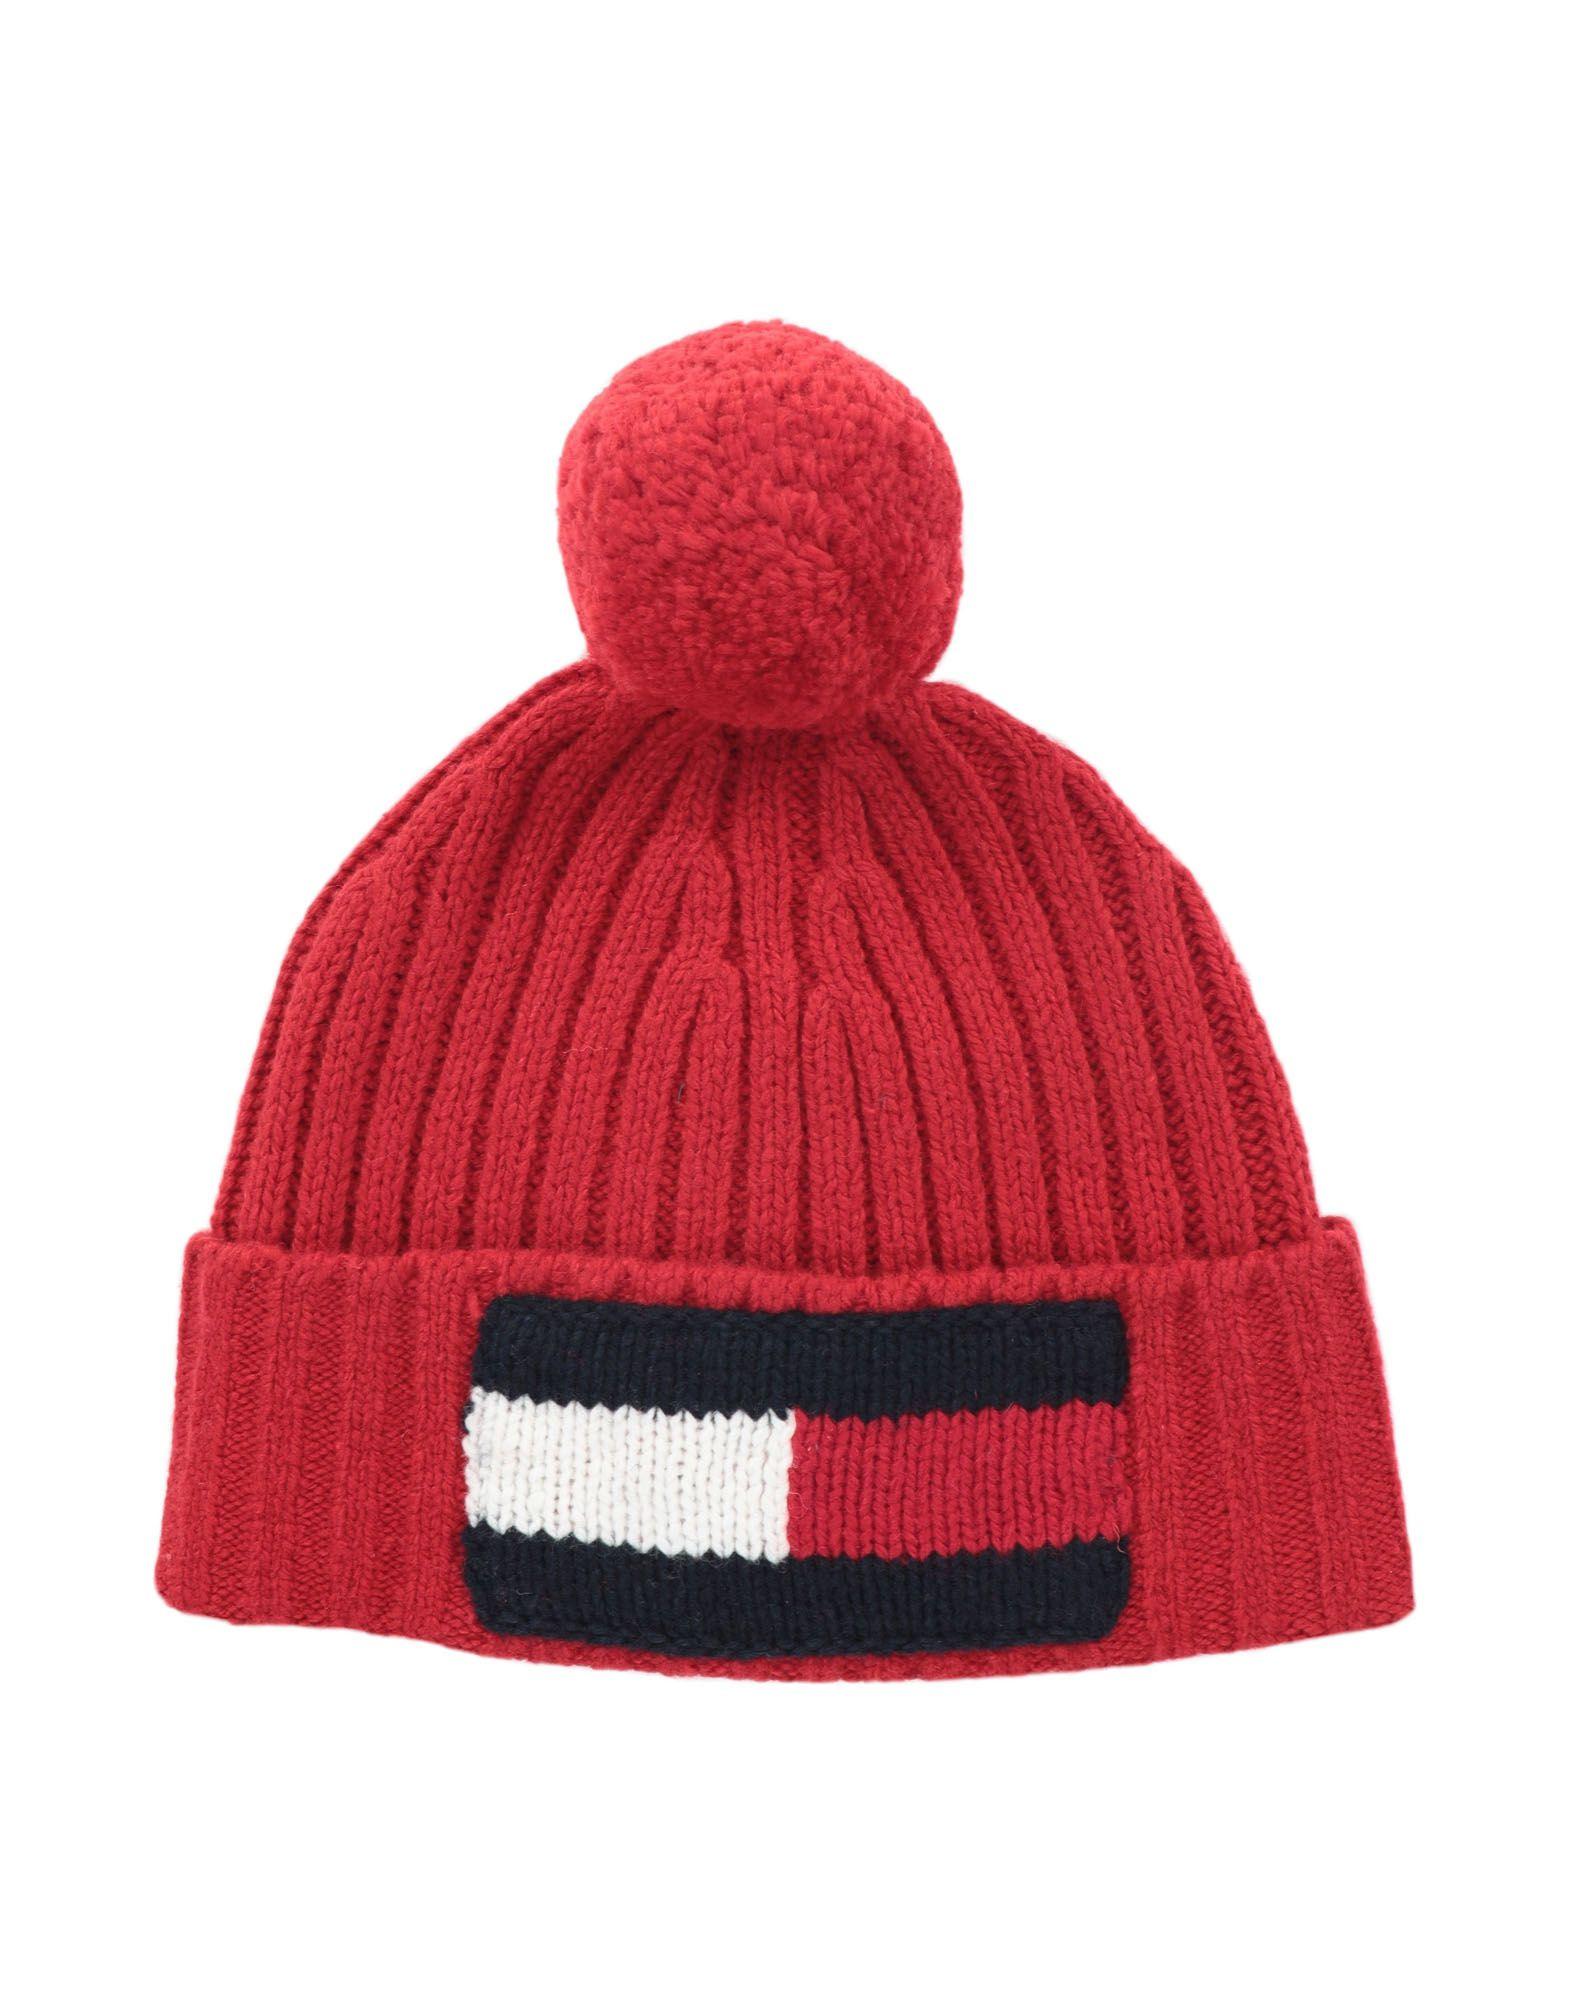 ed5c81300b633 Tommy Hilfiger Hat - Women Tommy Hilfiger Hats online on YOOX ...